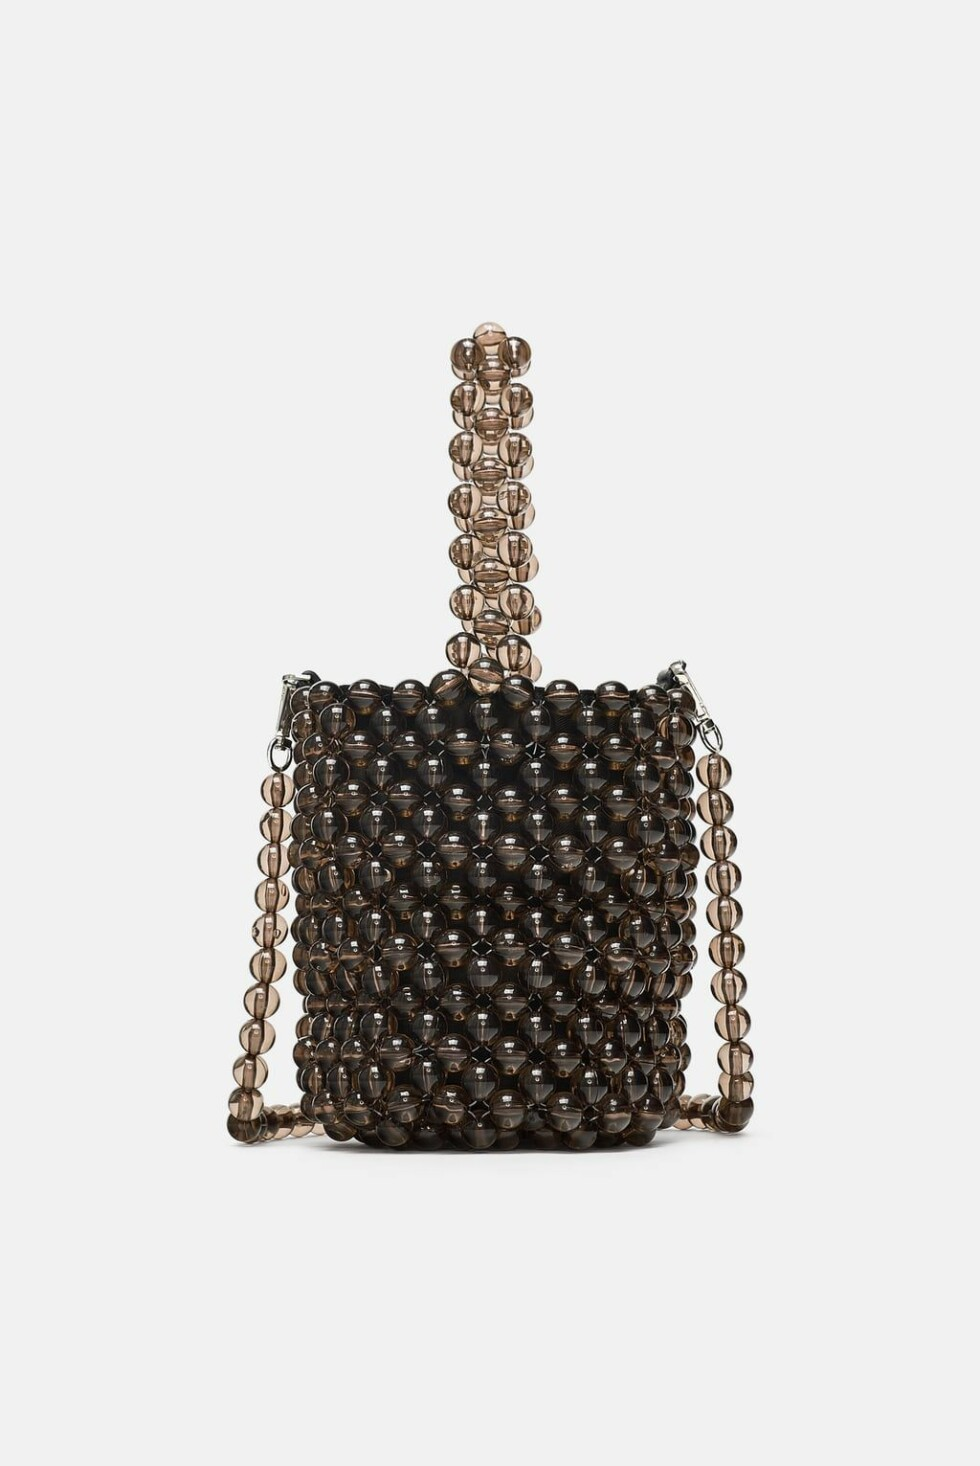 Veske fra Zara |500,-| https://www.zara.com/no/no/mini-poseveske-med-sm%C3%A5-kuler-p16420304.html?v1=7503518&v2=1074660